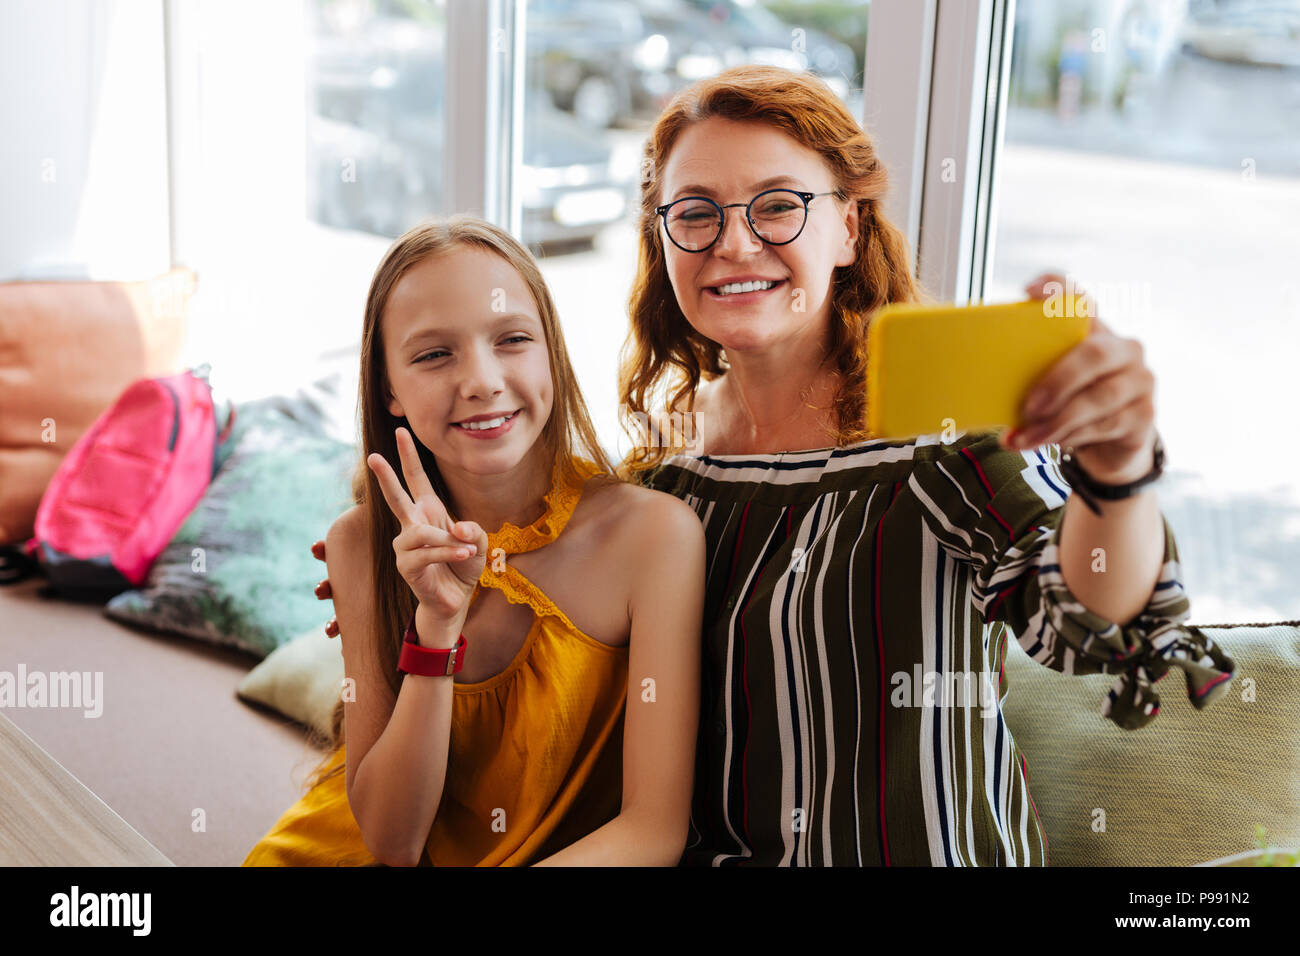 Mère amoureuse moderne faisant fille adolescente avec selfies Photo Stock